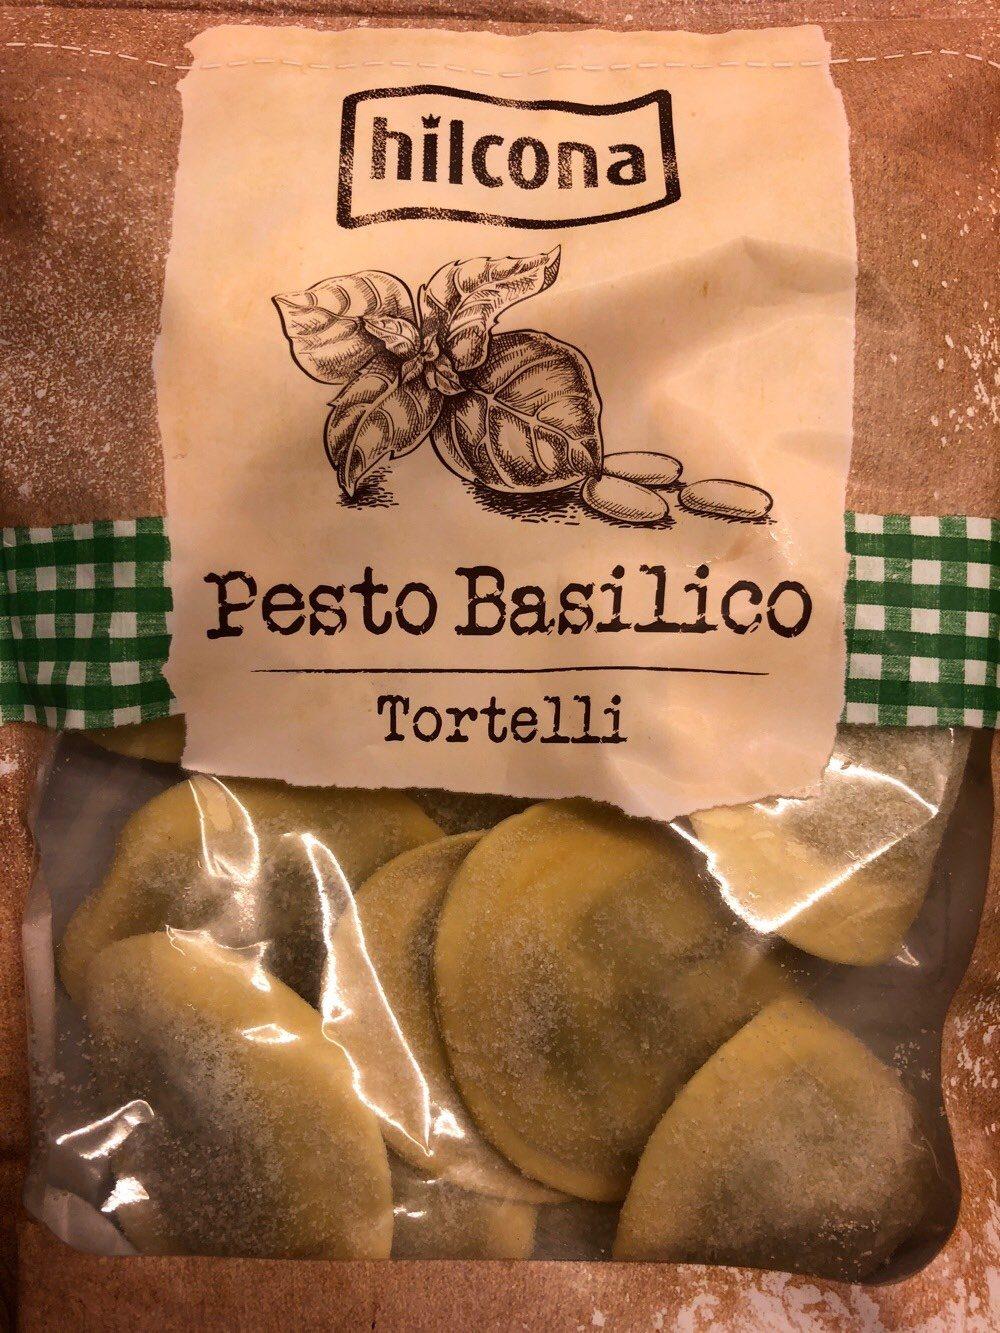 Tortelli pesto basilico - Product